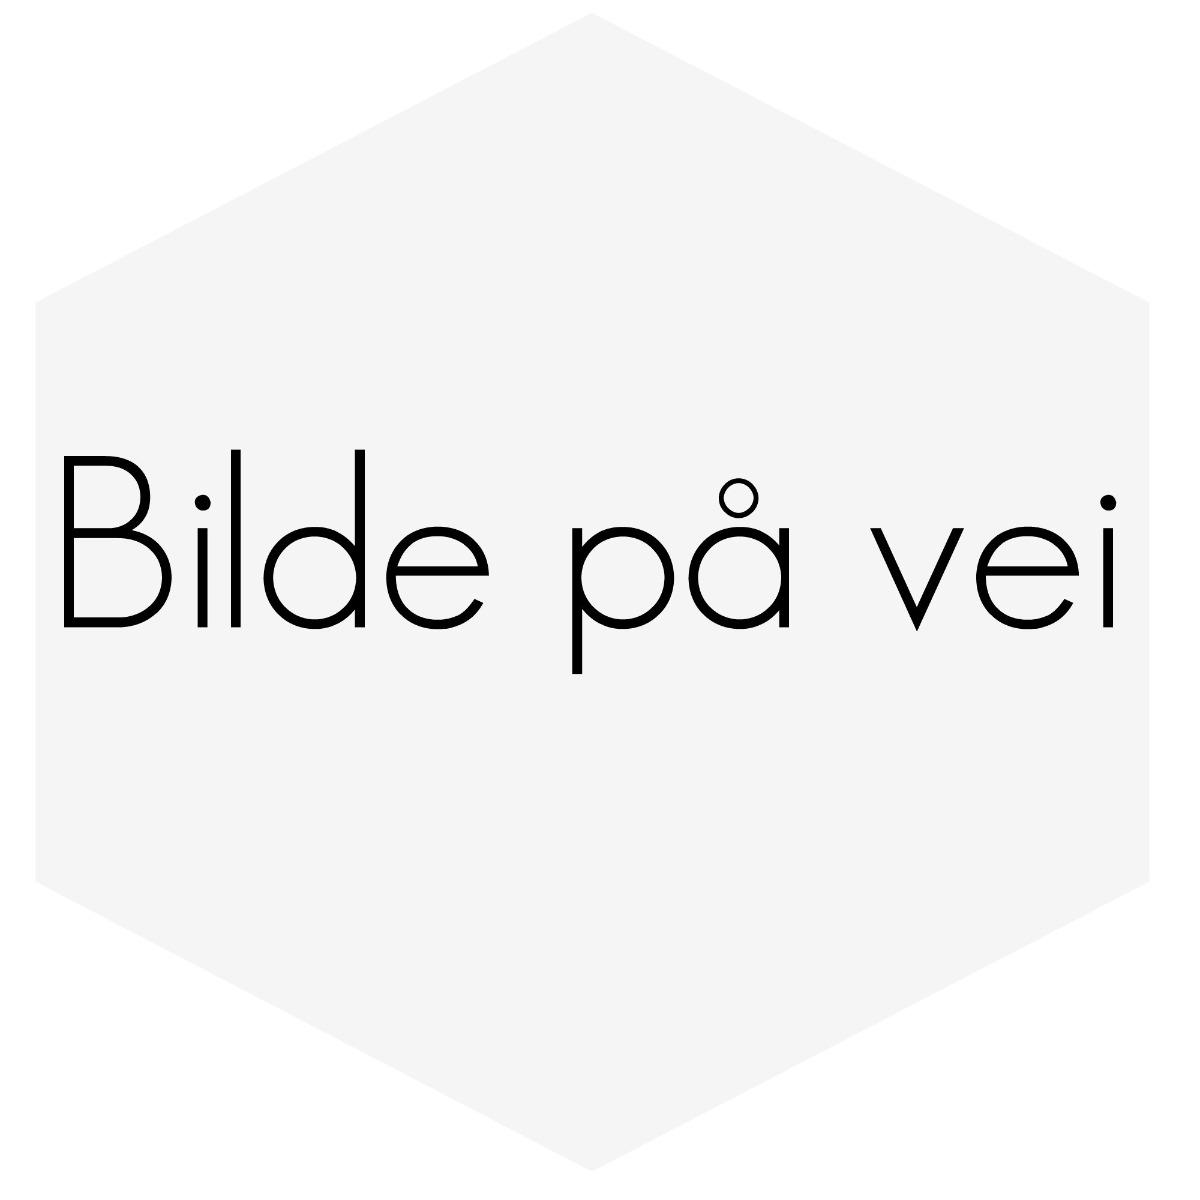 AUDI S4 / RS4 2,7 BITURBO KJØLESLANGE RØD